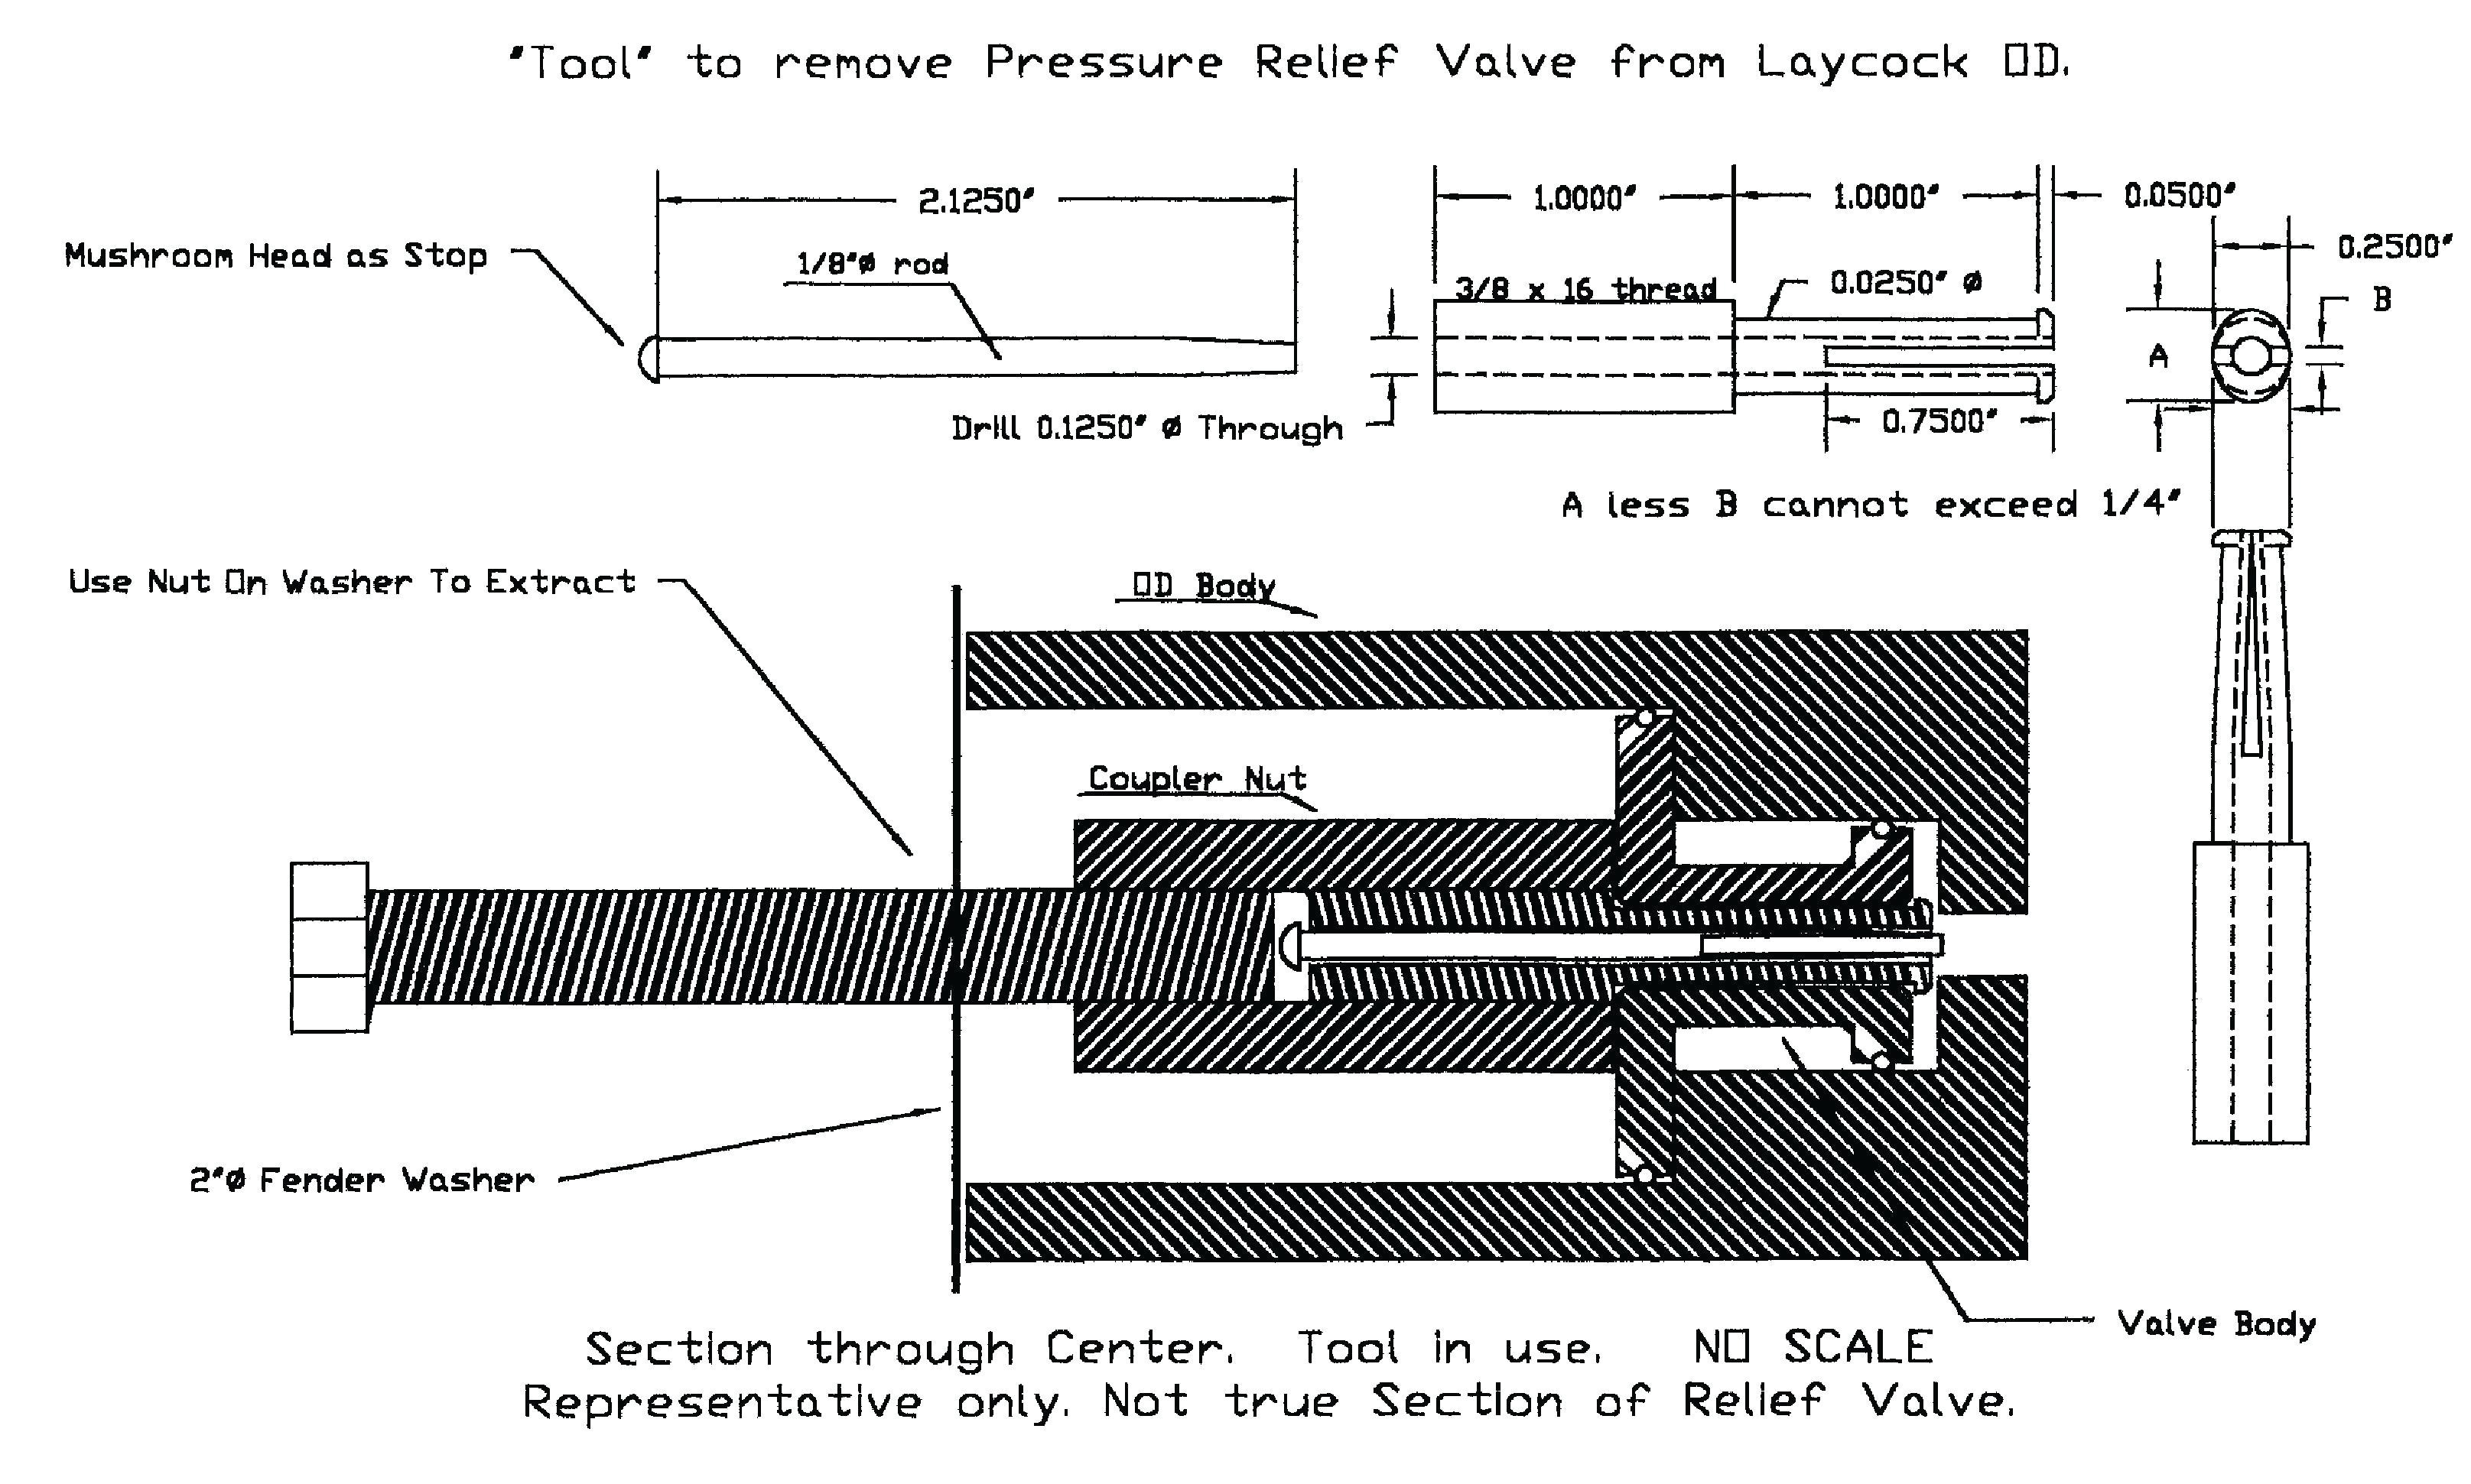 race car wiring diagram wiring diagram for race car kill switch new luxury kill switch of race car wiring diagram jpg